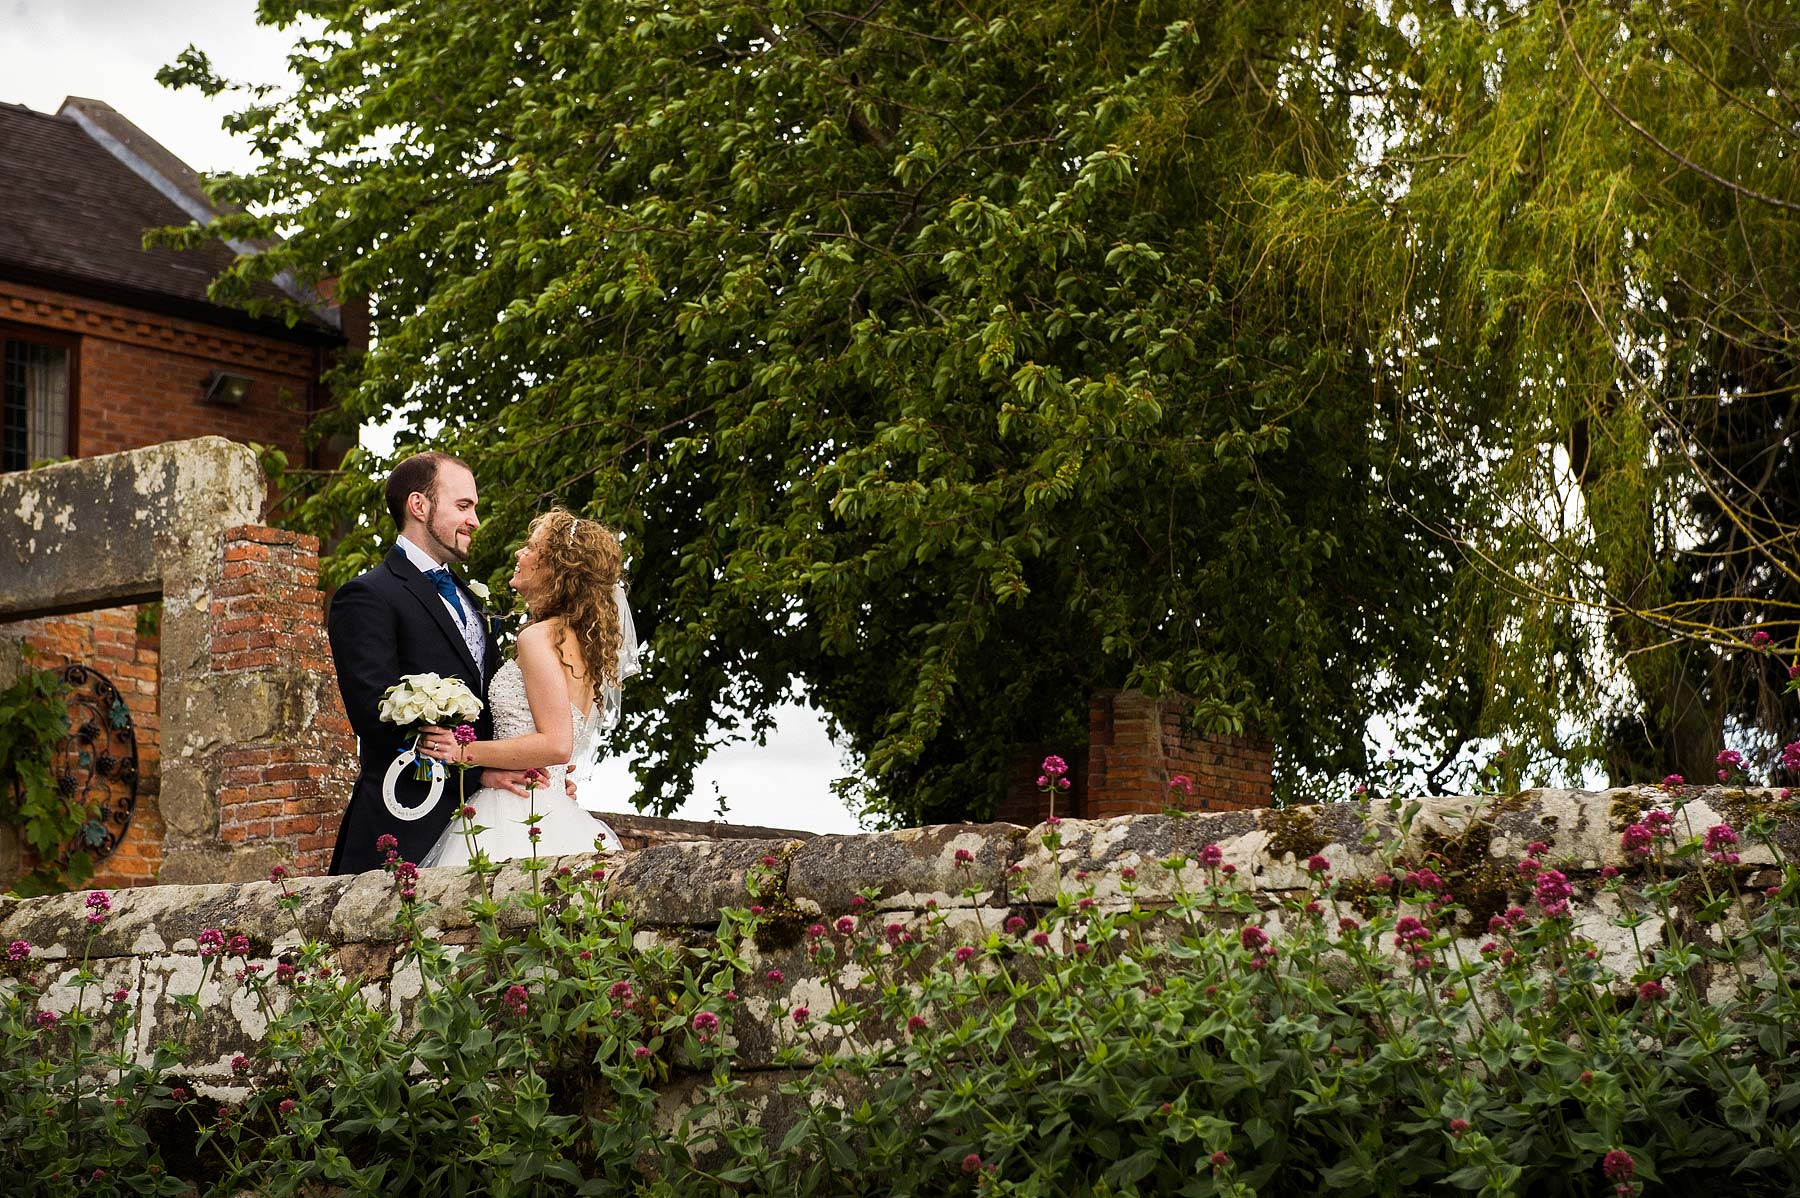 albright-hussey-manor-wedding-photographers-045